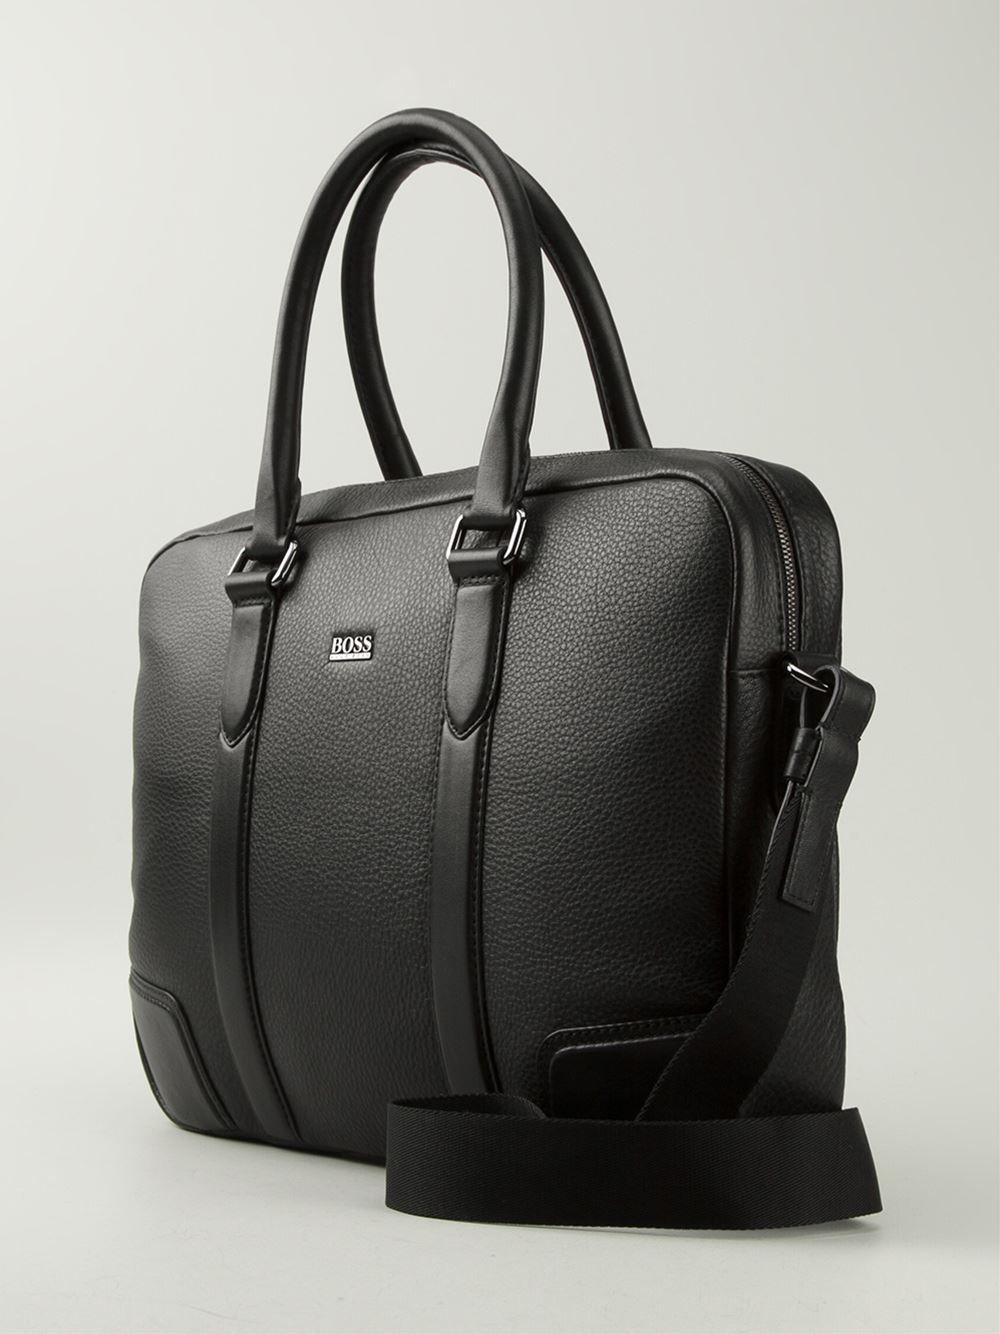 Boss Hugo Boss Laptop Shoulder Bag - United Legend Mulhouse - Farfetch.com 48f6d42353d8c